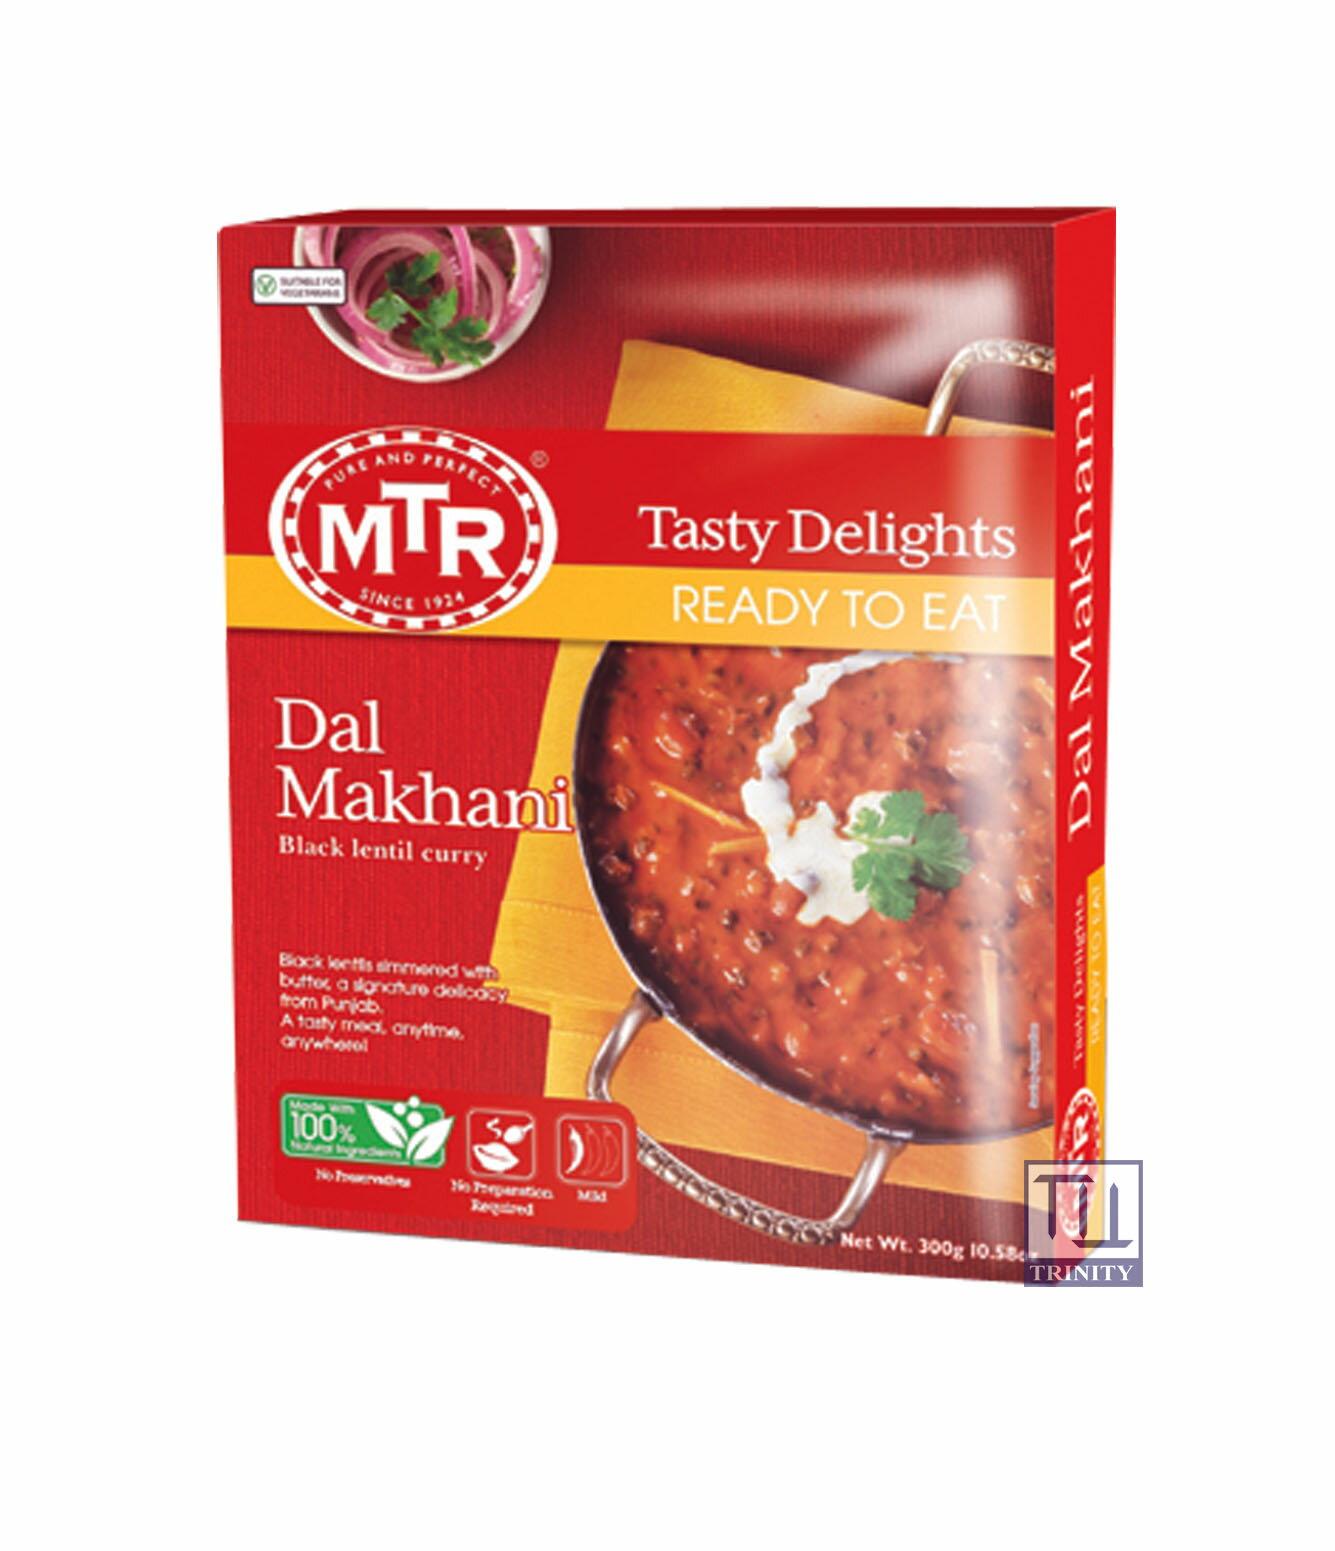 Mtr Dal Makhani 印度黑豆咖哩即食調理包